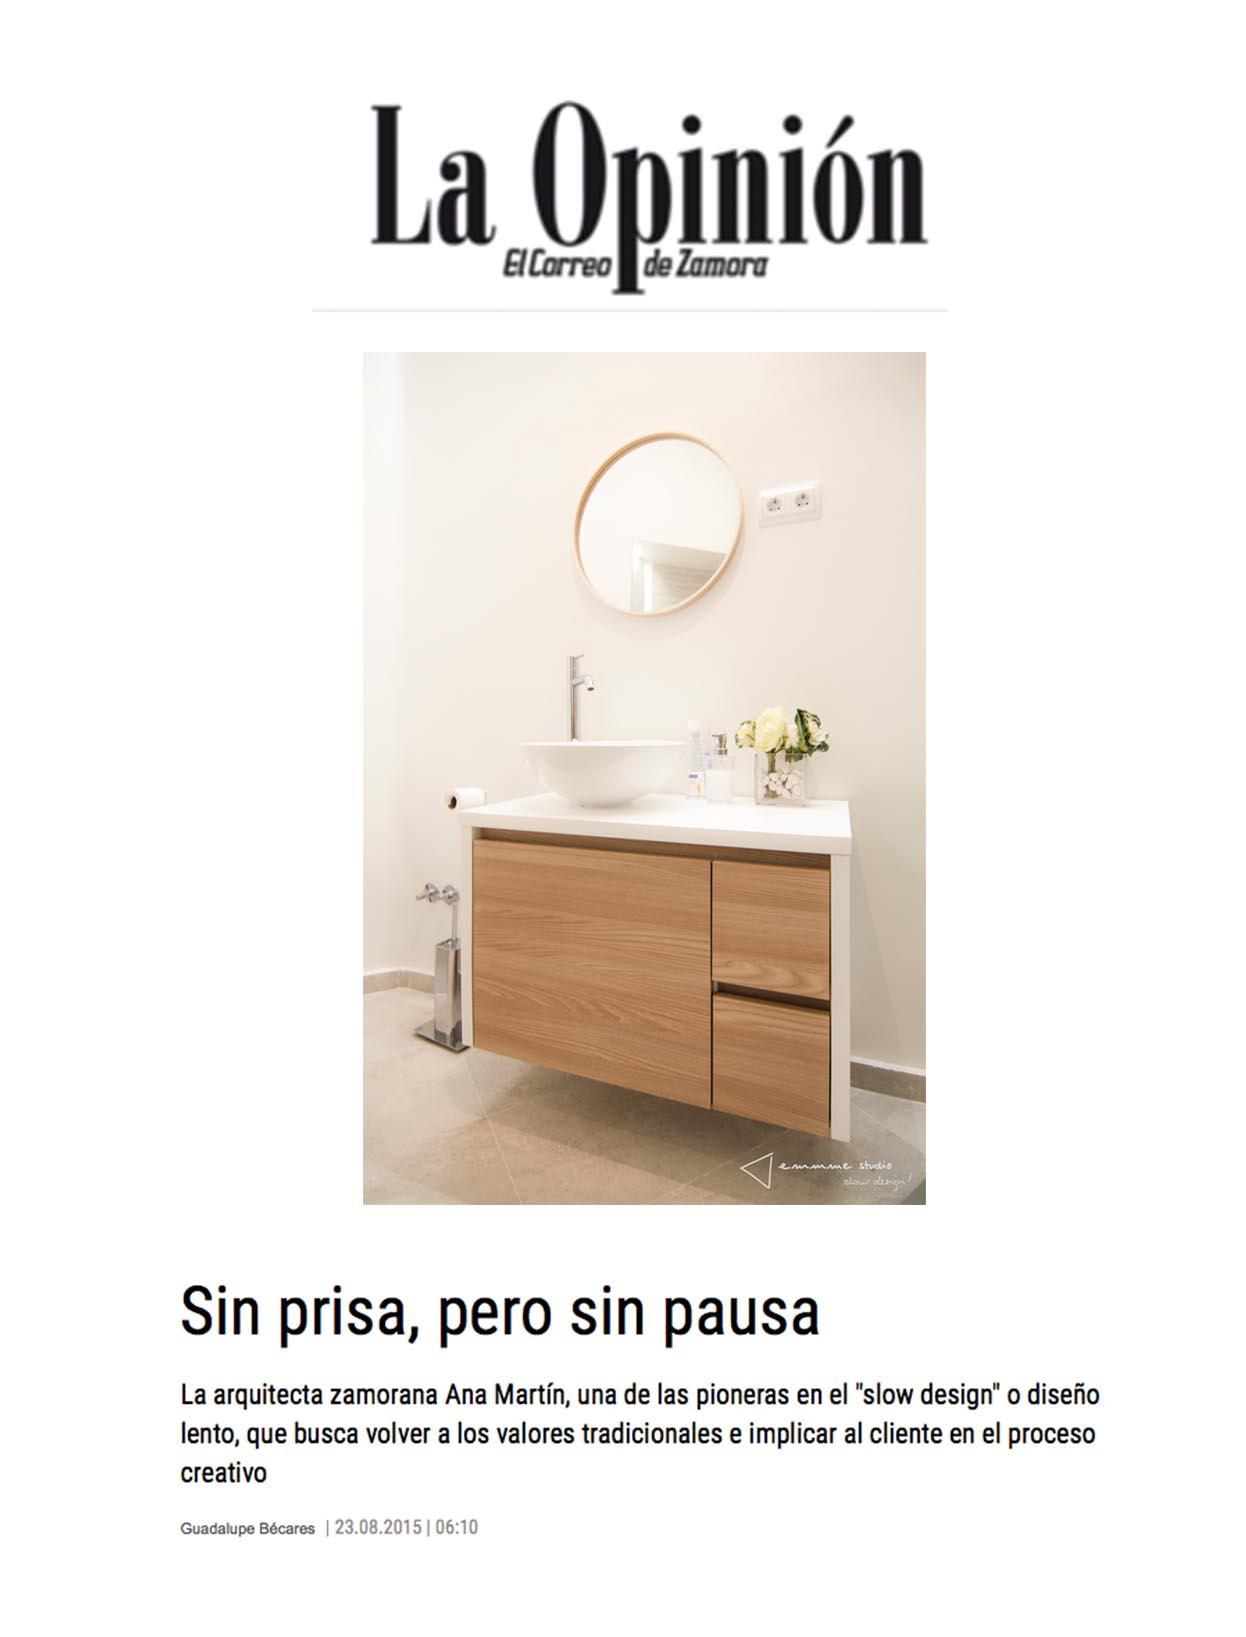 emmme studio la opinion zamora reformas diseño slow prensa entrevista.jpg